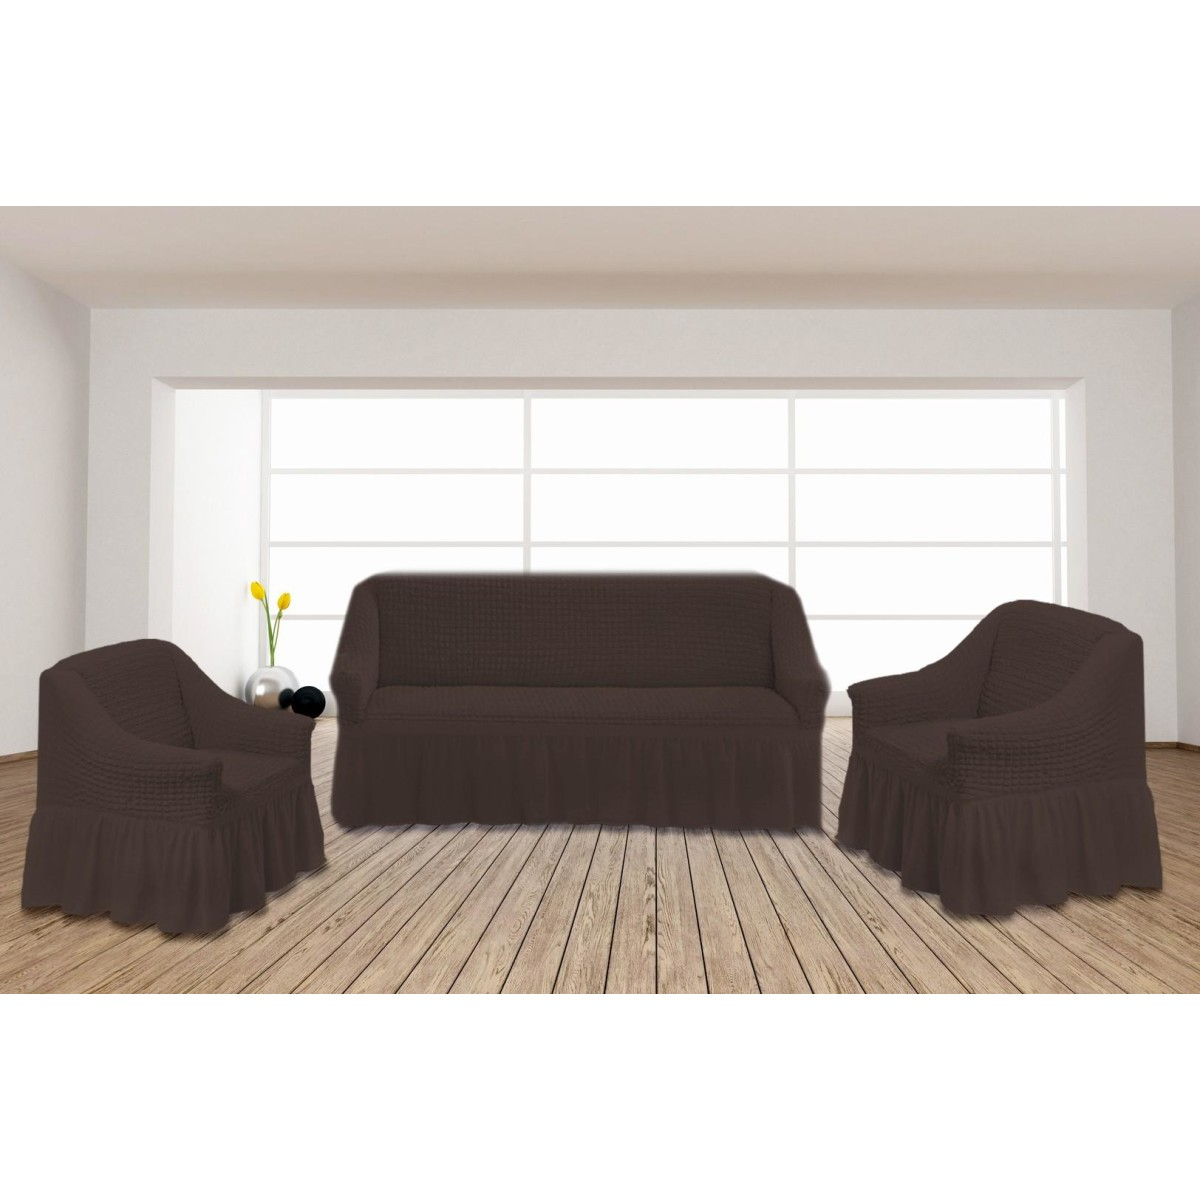 Комплект чехлов для мебели Texrepublic Absolute 8818